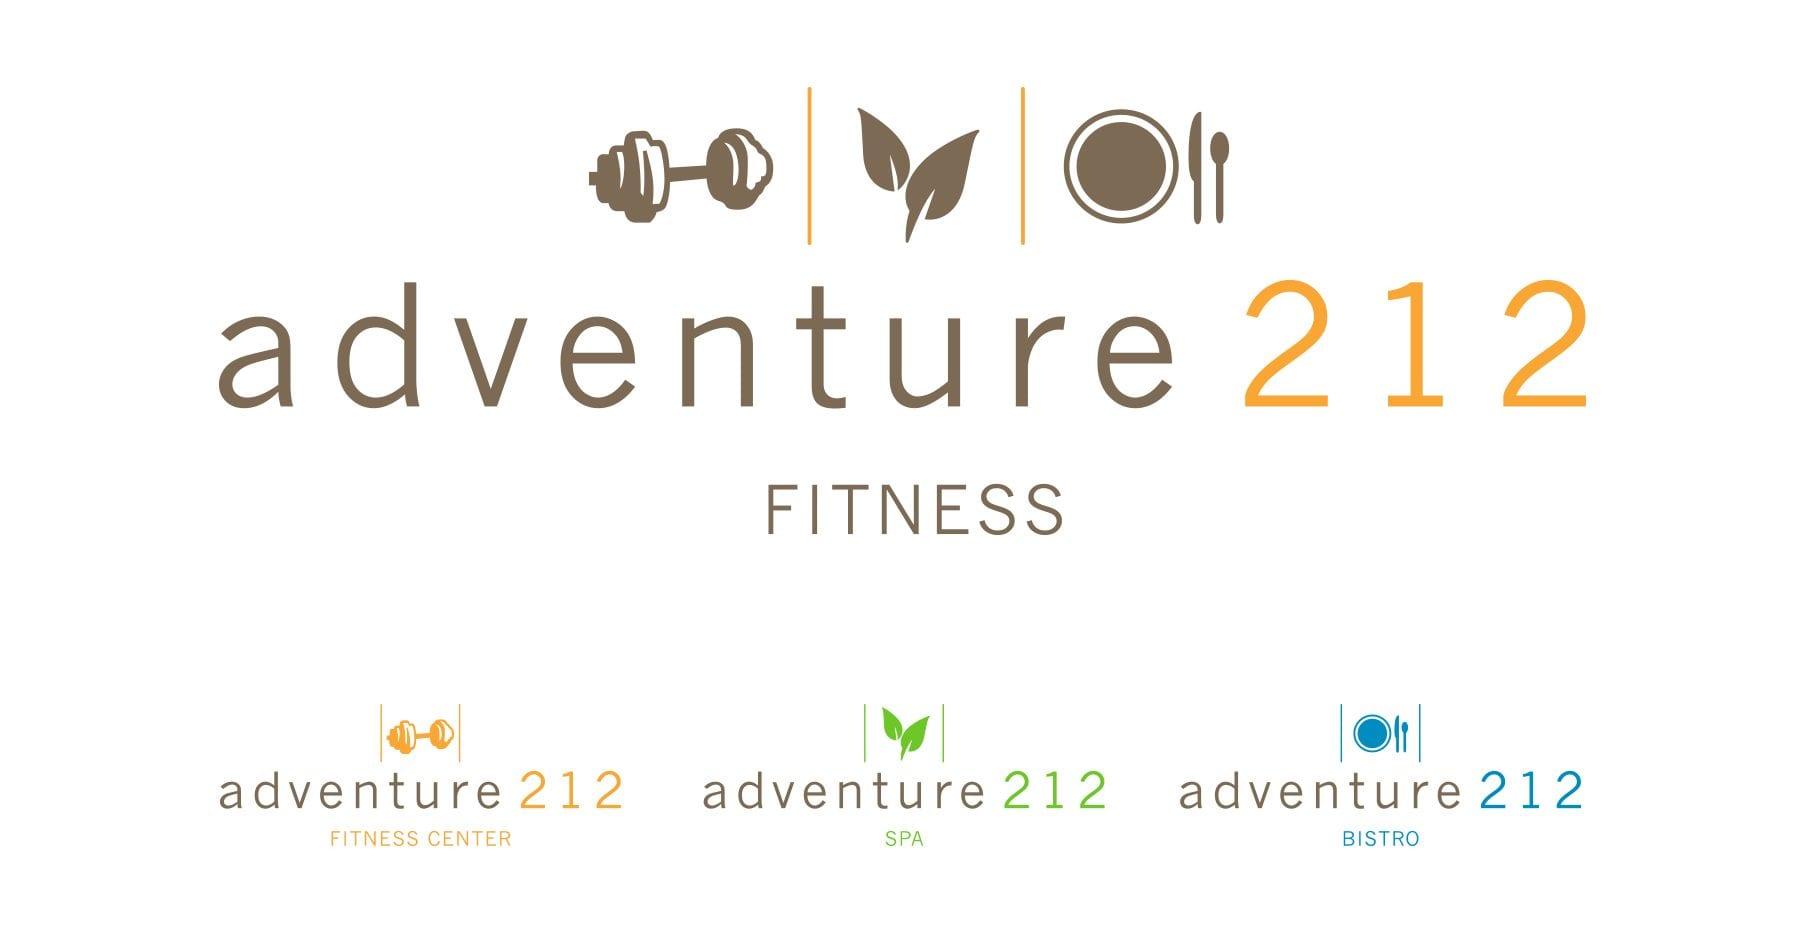 Adventure 212 Fitness